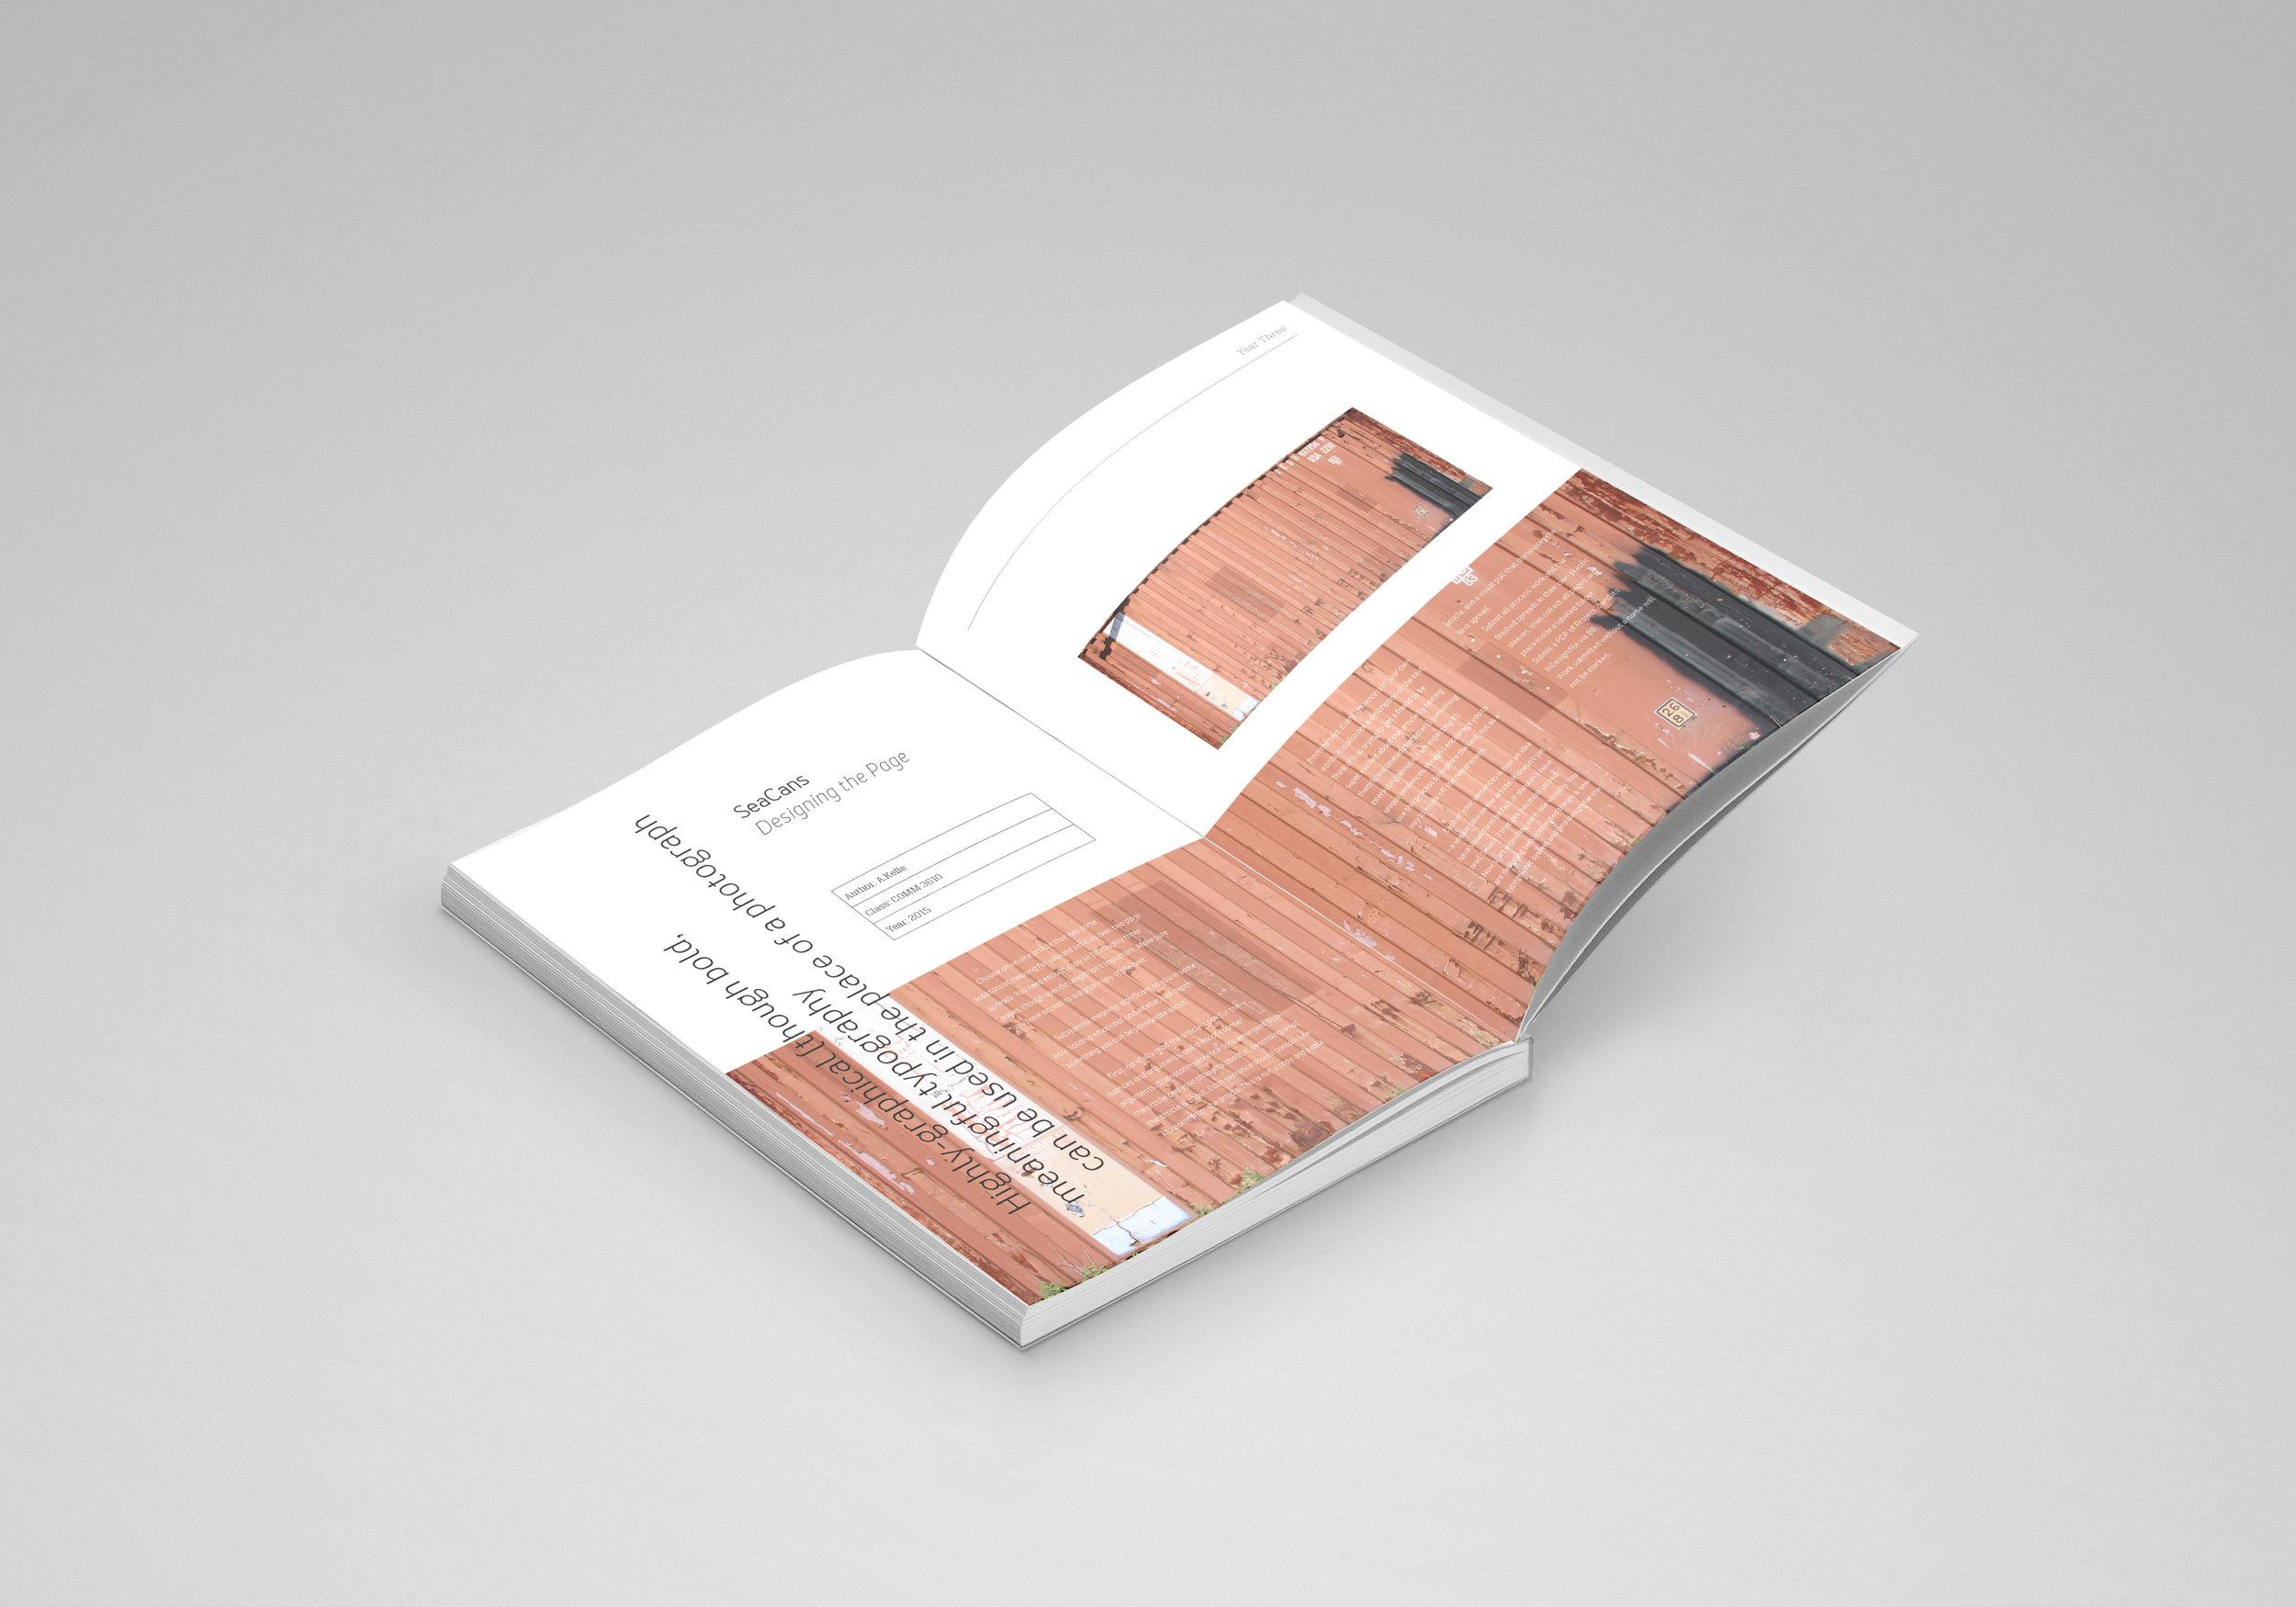 Books_Form_mockup2.jpg